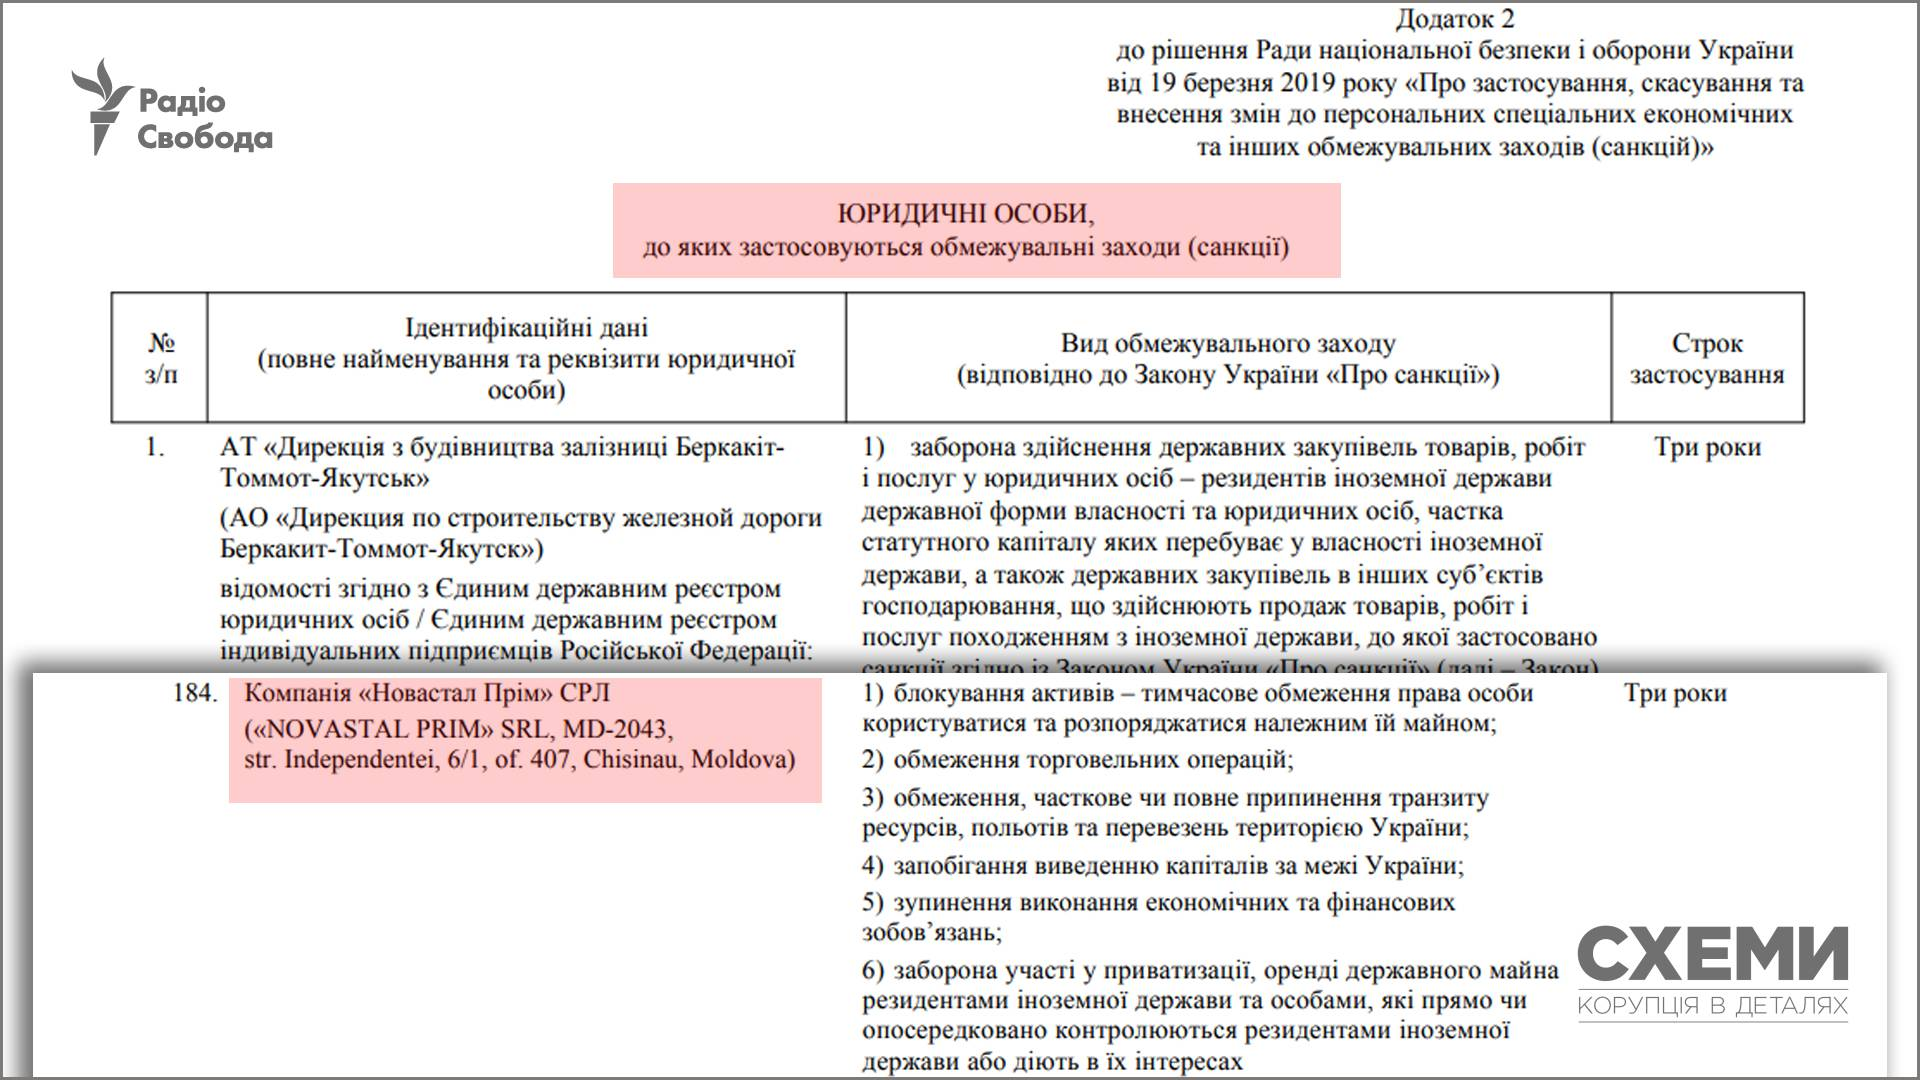 novastal-sanktii-19-1